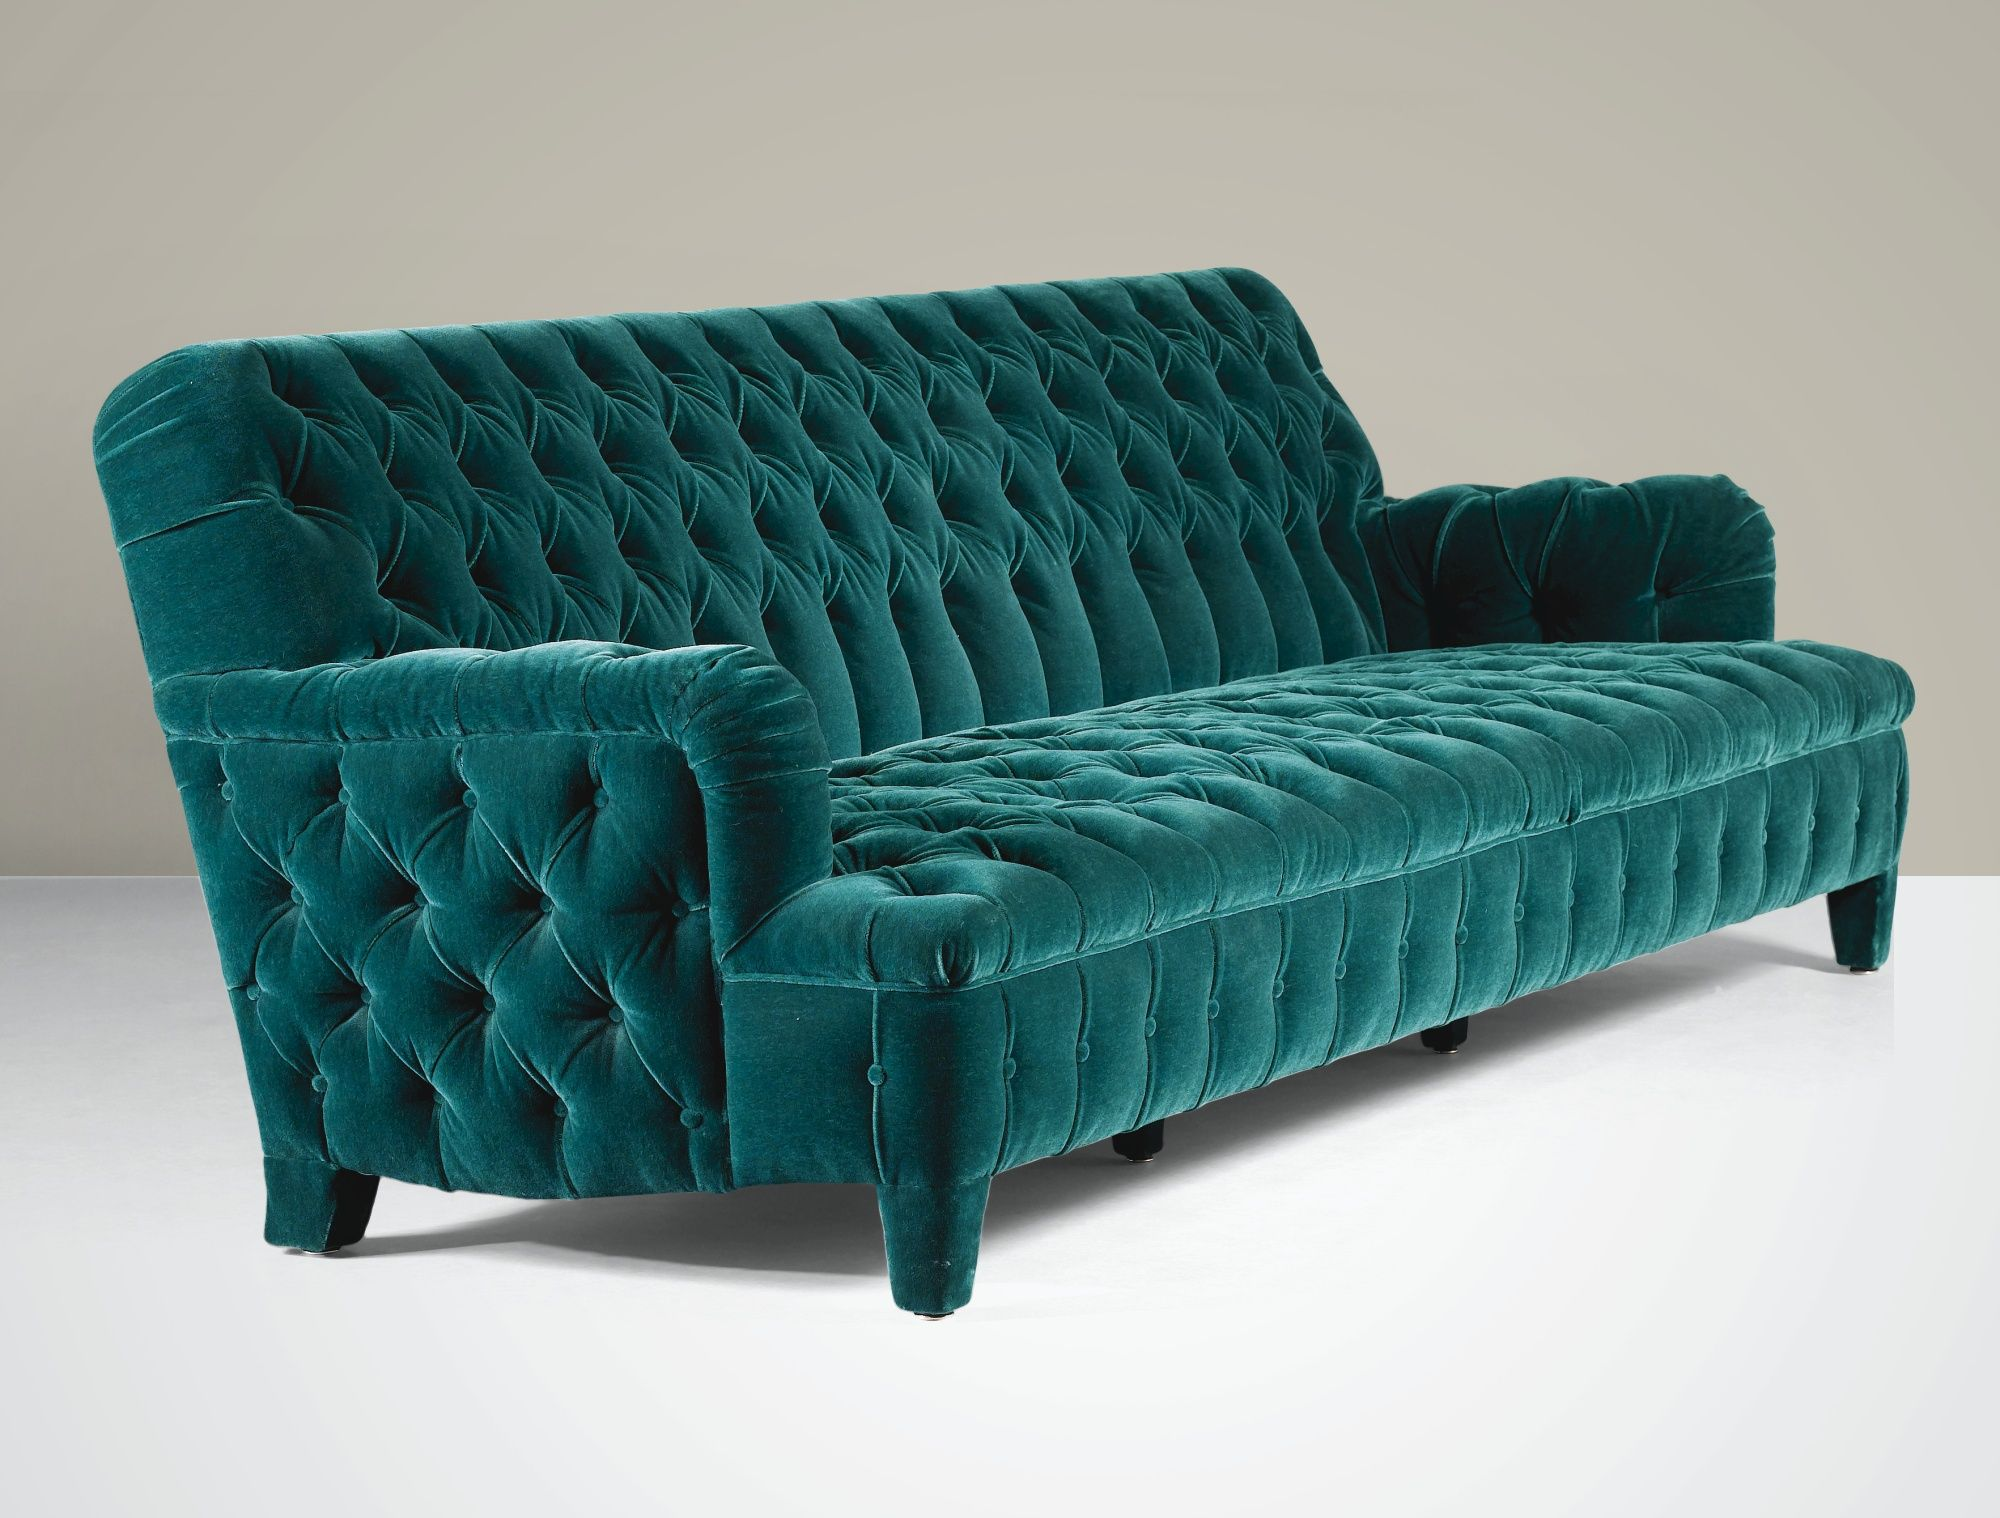 58 best Sofa Design images on Pinterest